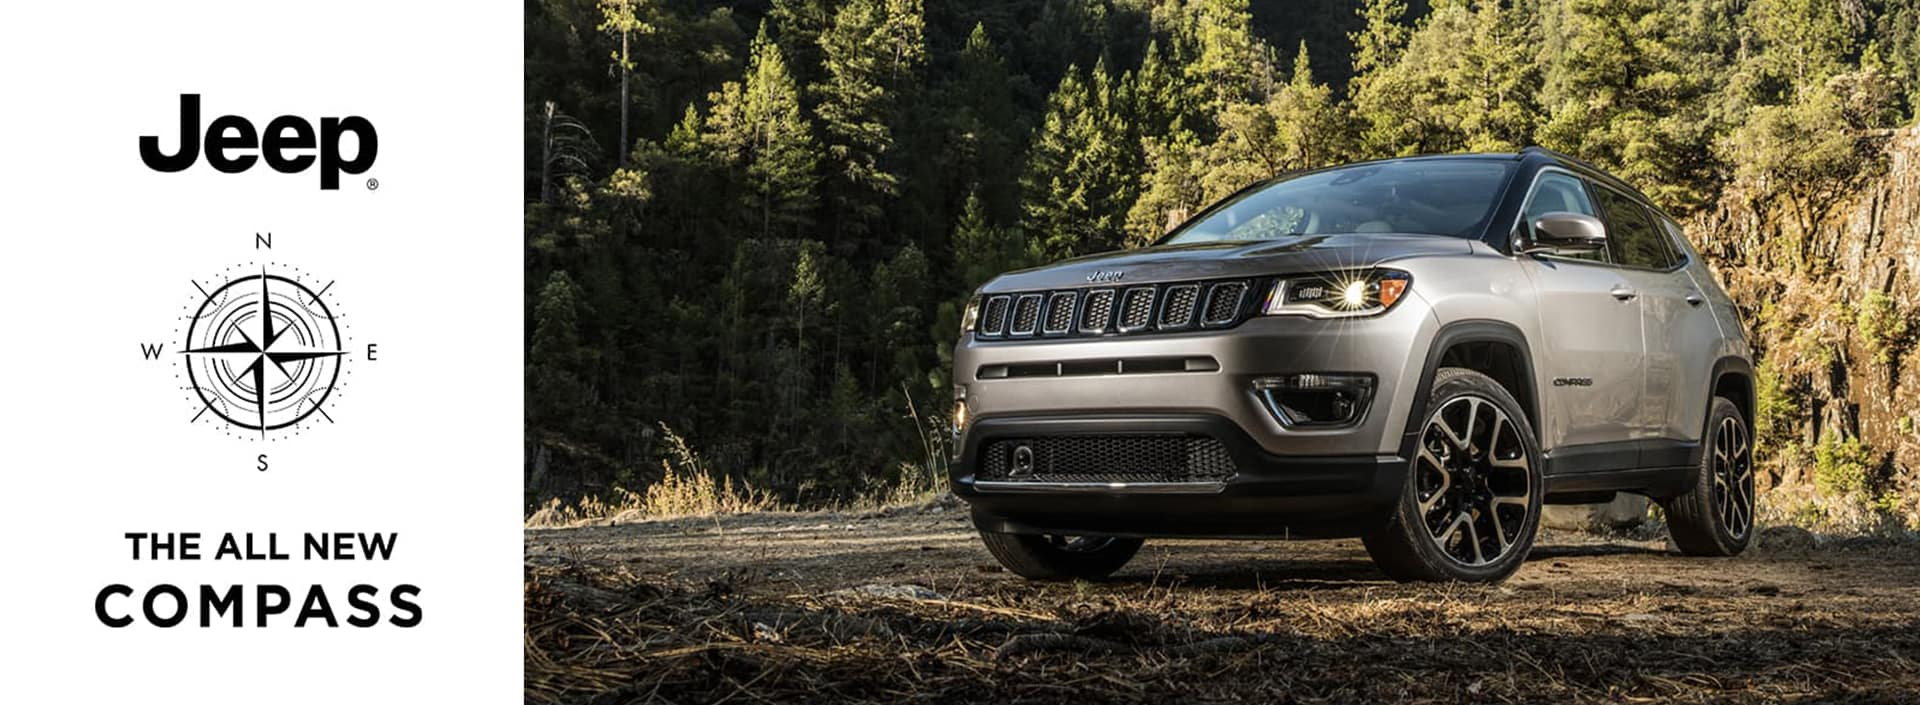 Jeep Compass Banner